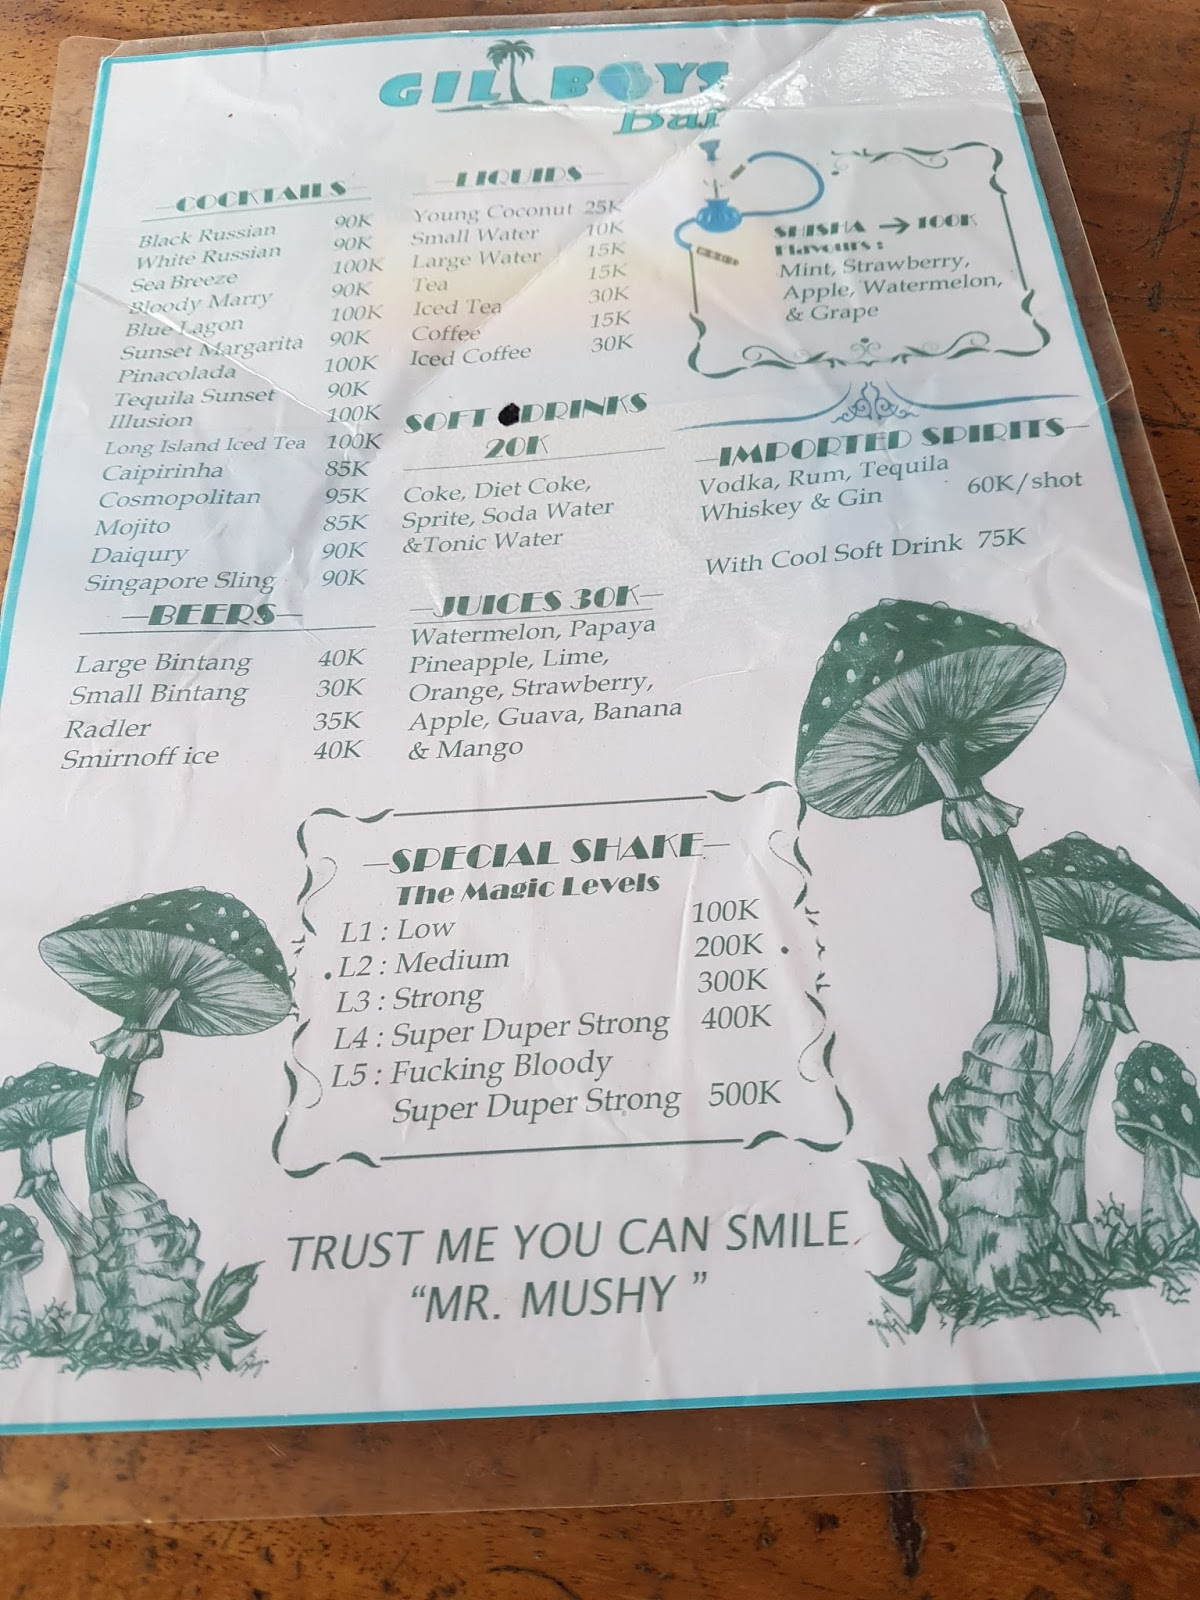 Magic mushrooms Gili Trawangan | Ummi Goes Where?